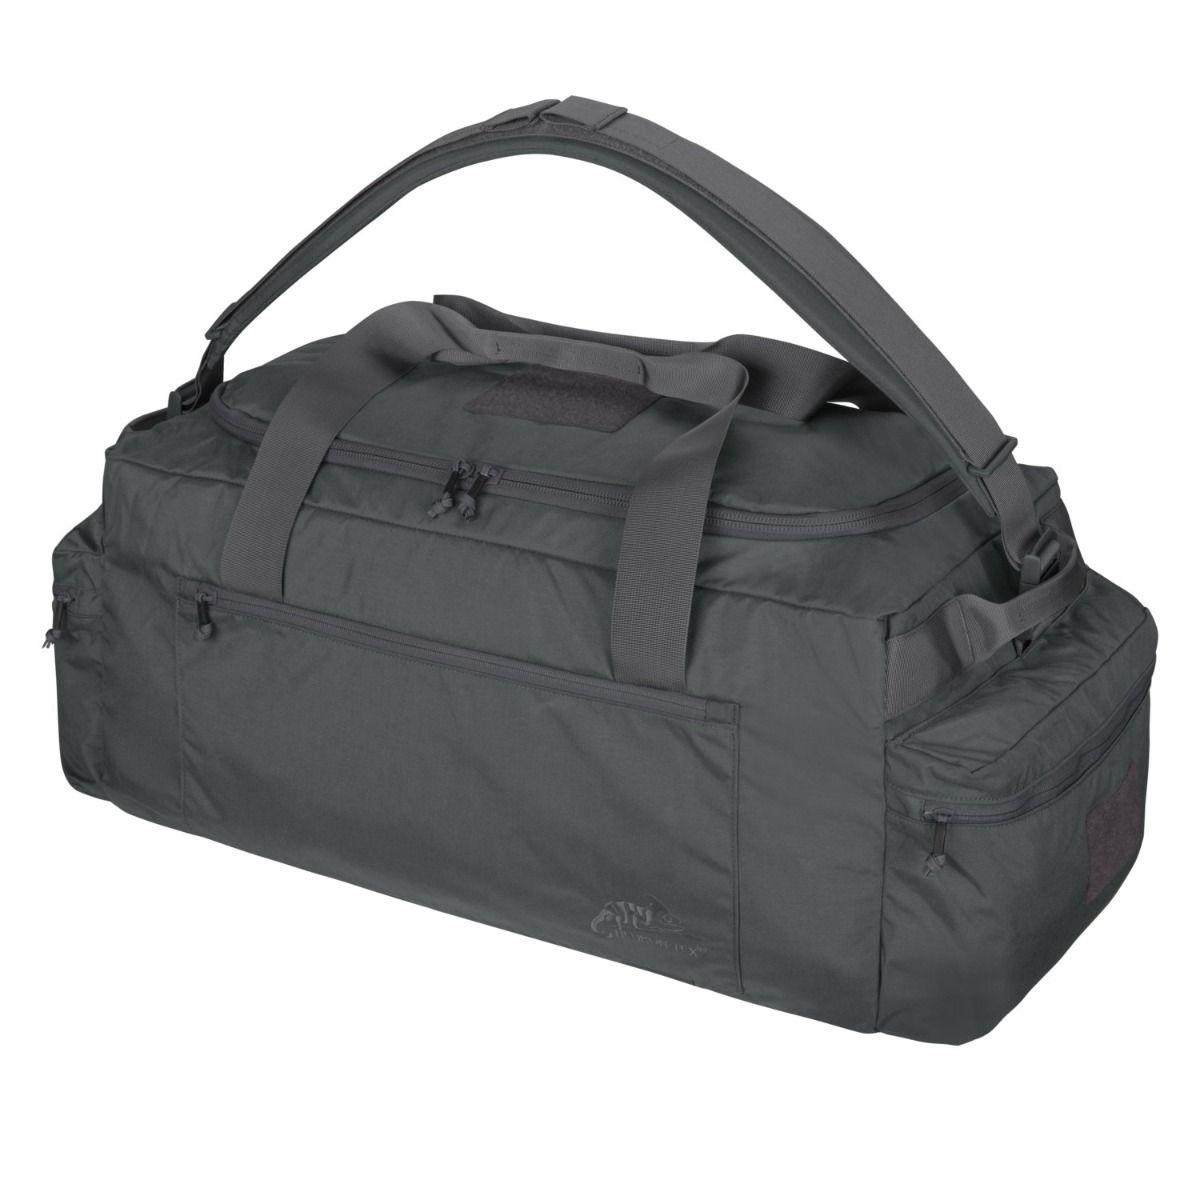 Taška URBAN TRAINING BAG® velká SHADOW GREY